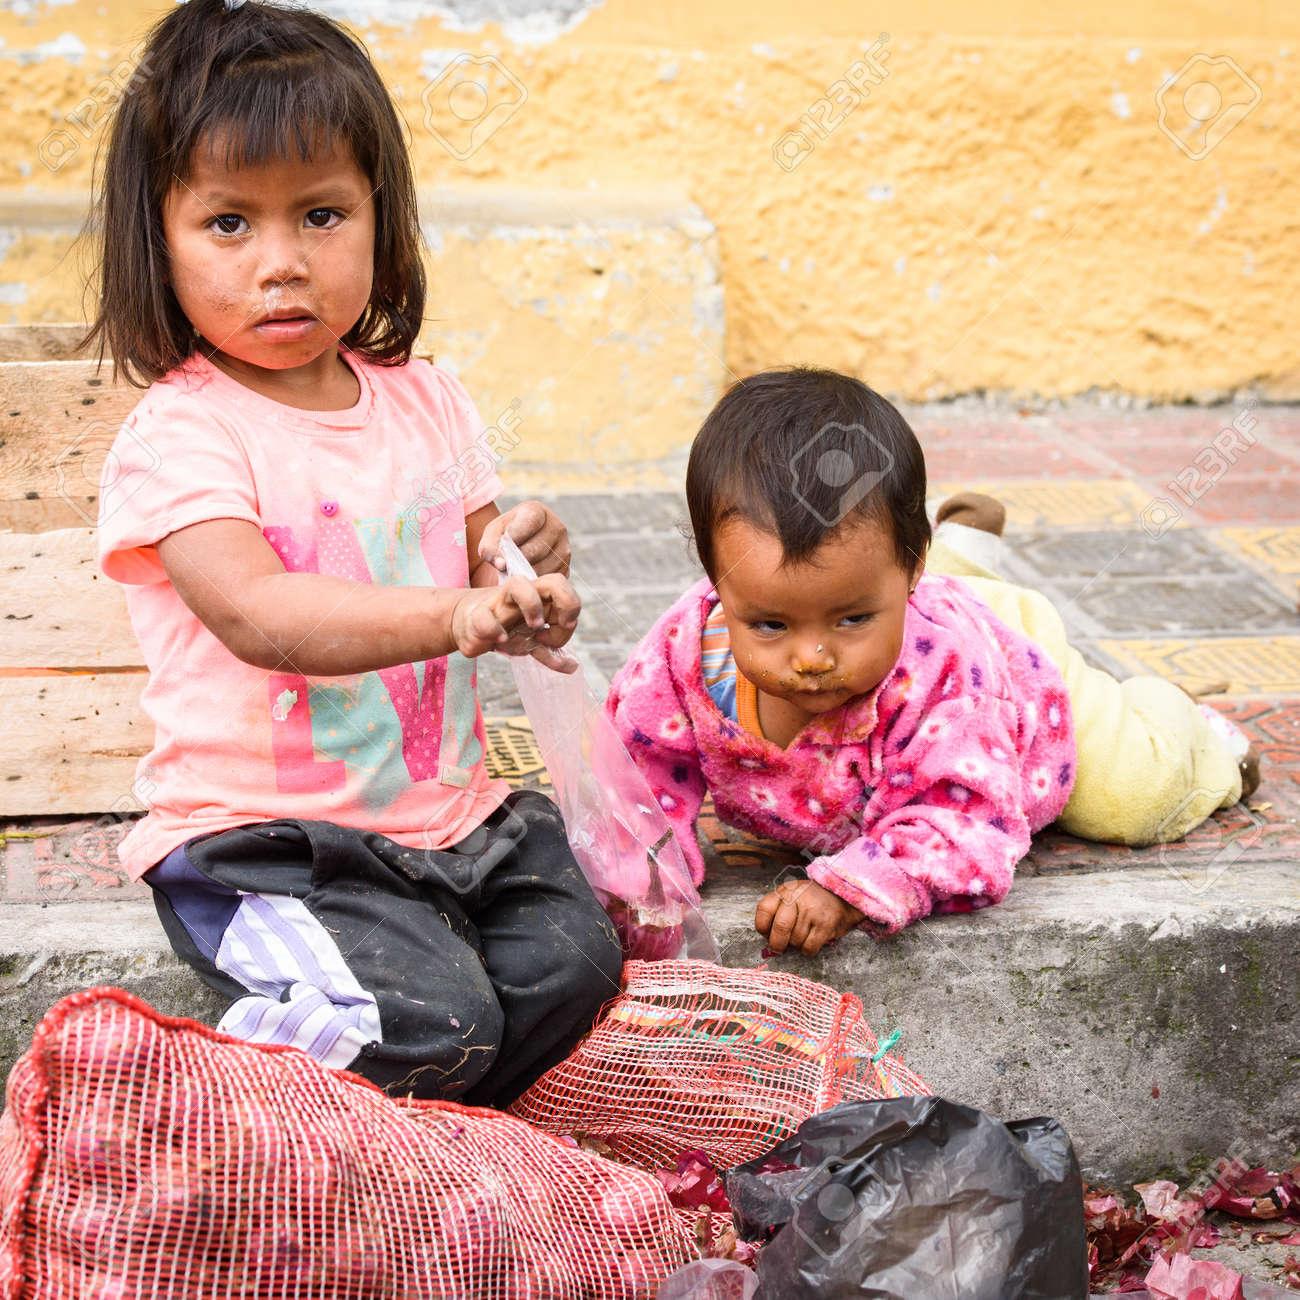 Otavalo ecuador jan 3 2015 unidentified ecuadorian children with onion at the